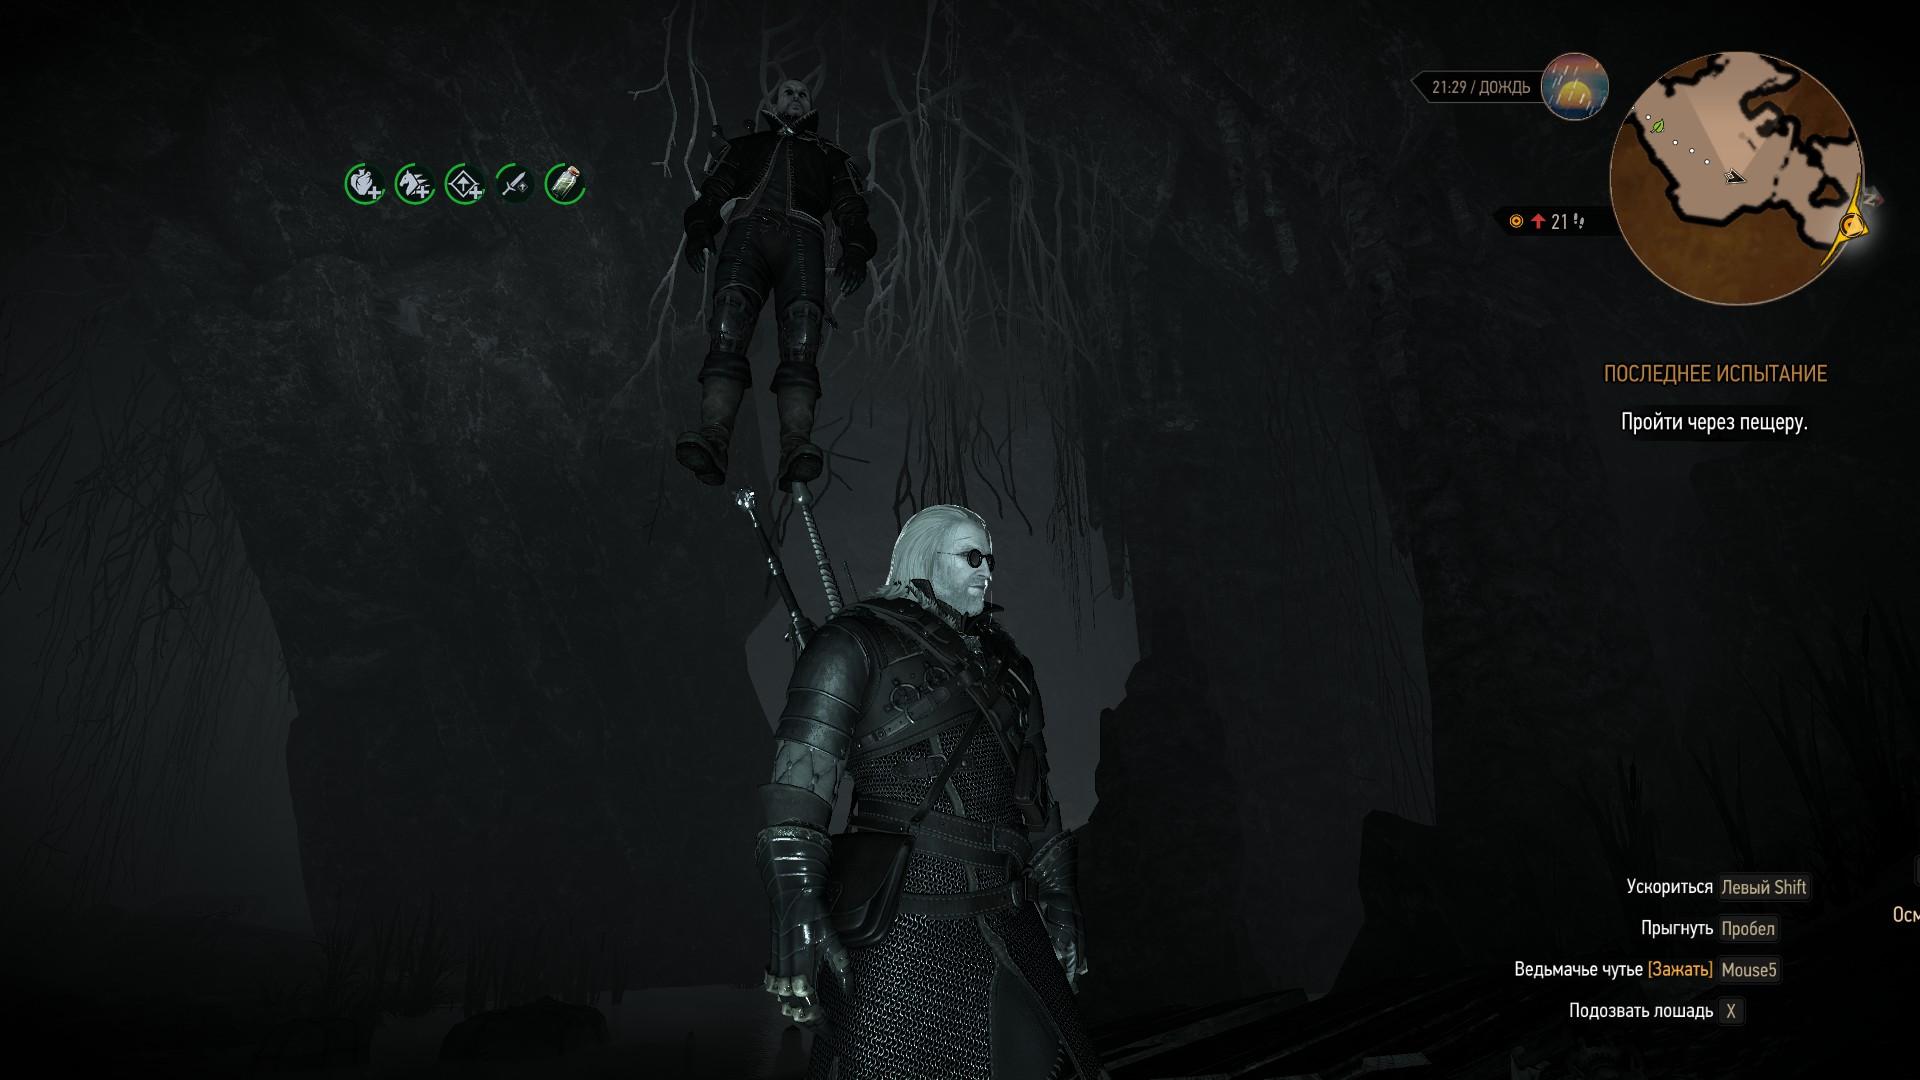 Ламберт, Ламберт... нутыпонял - Witcher 3: Wild Hunt, the Юмор